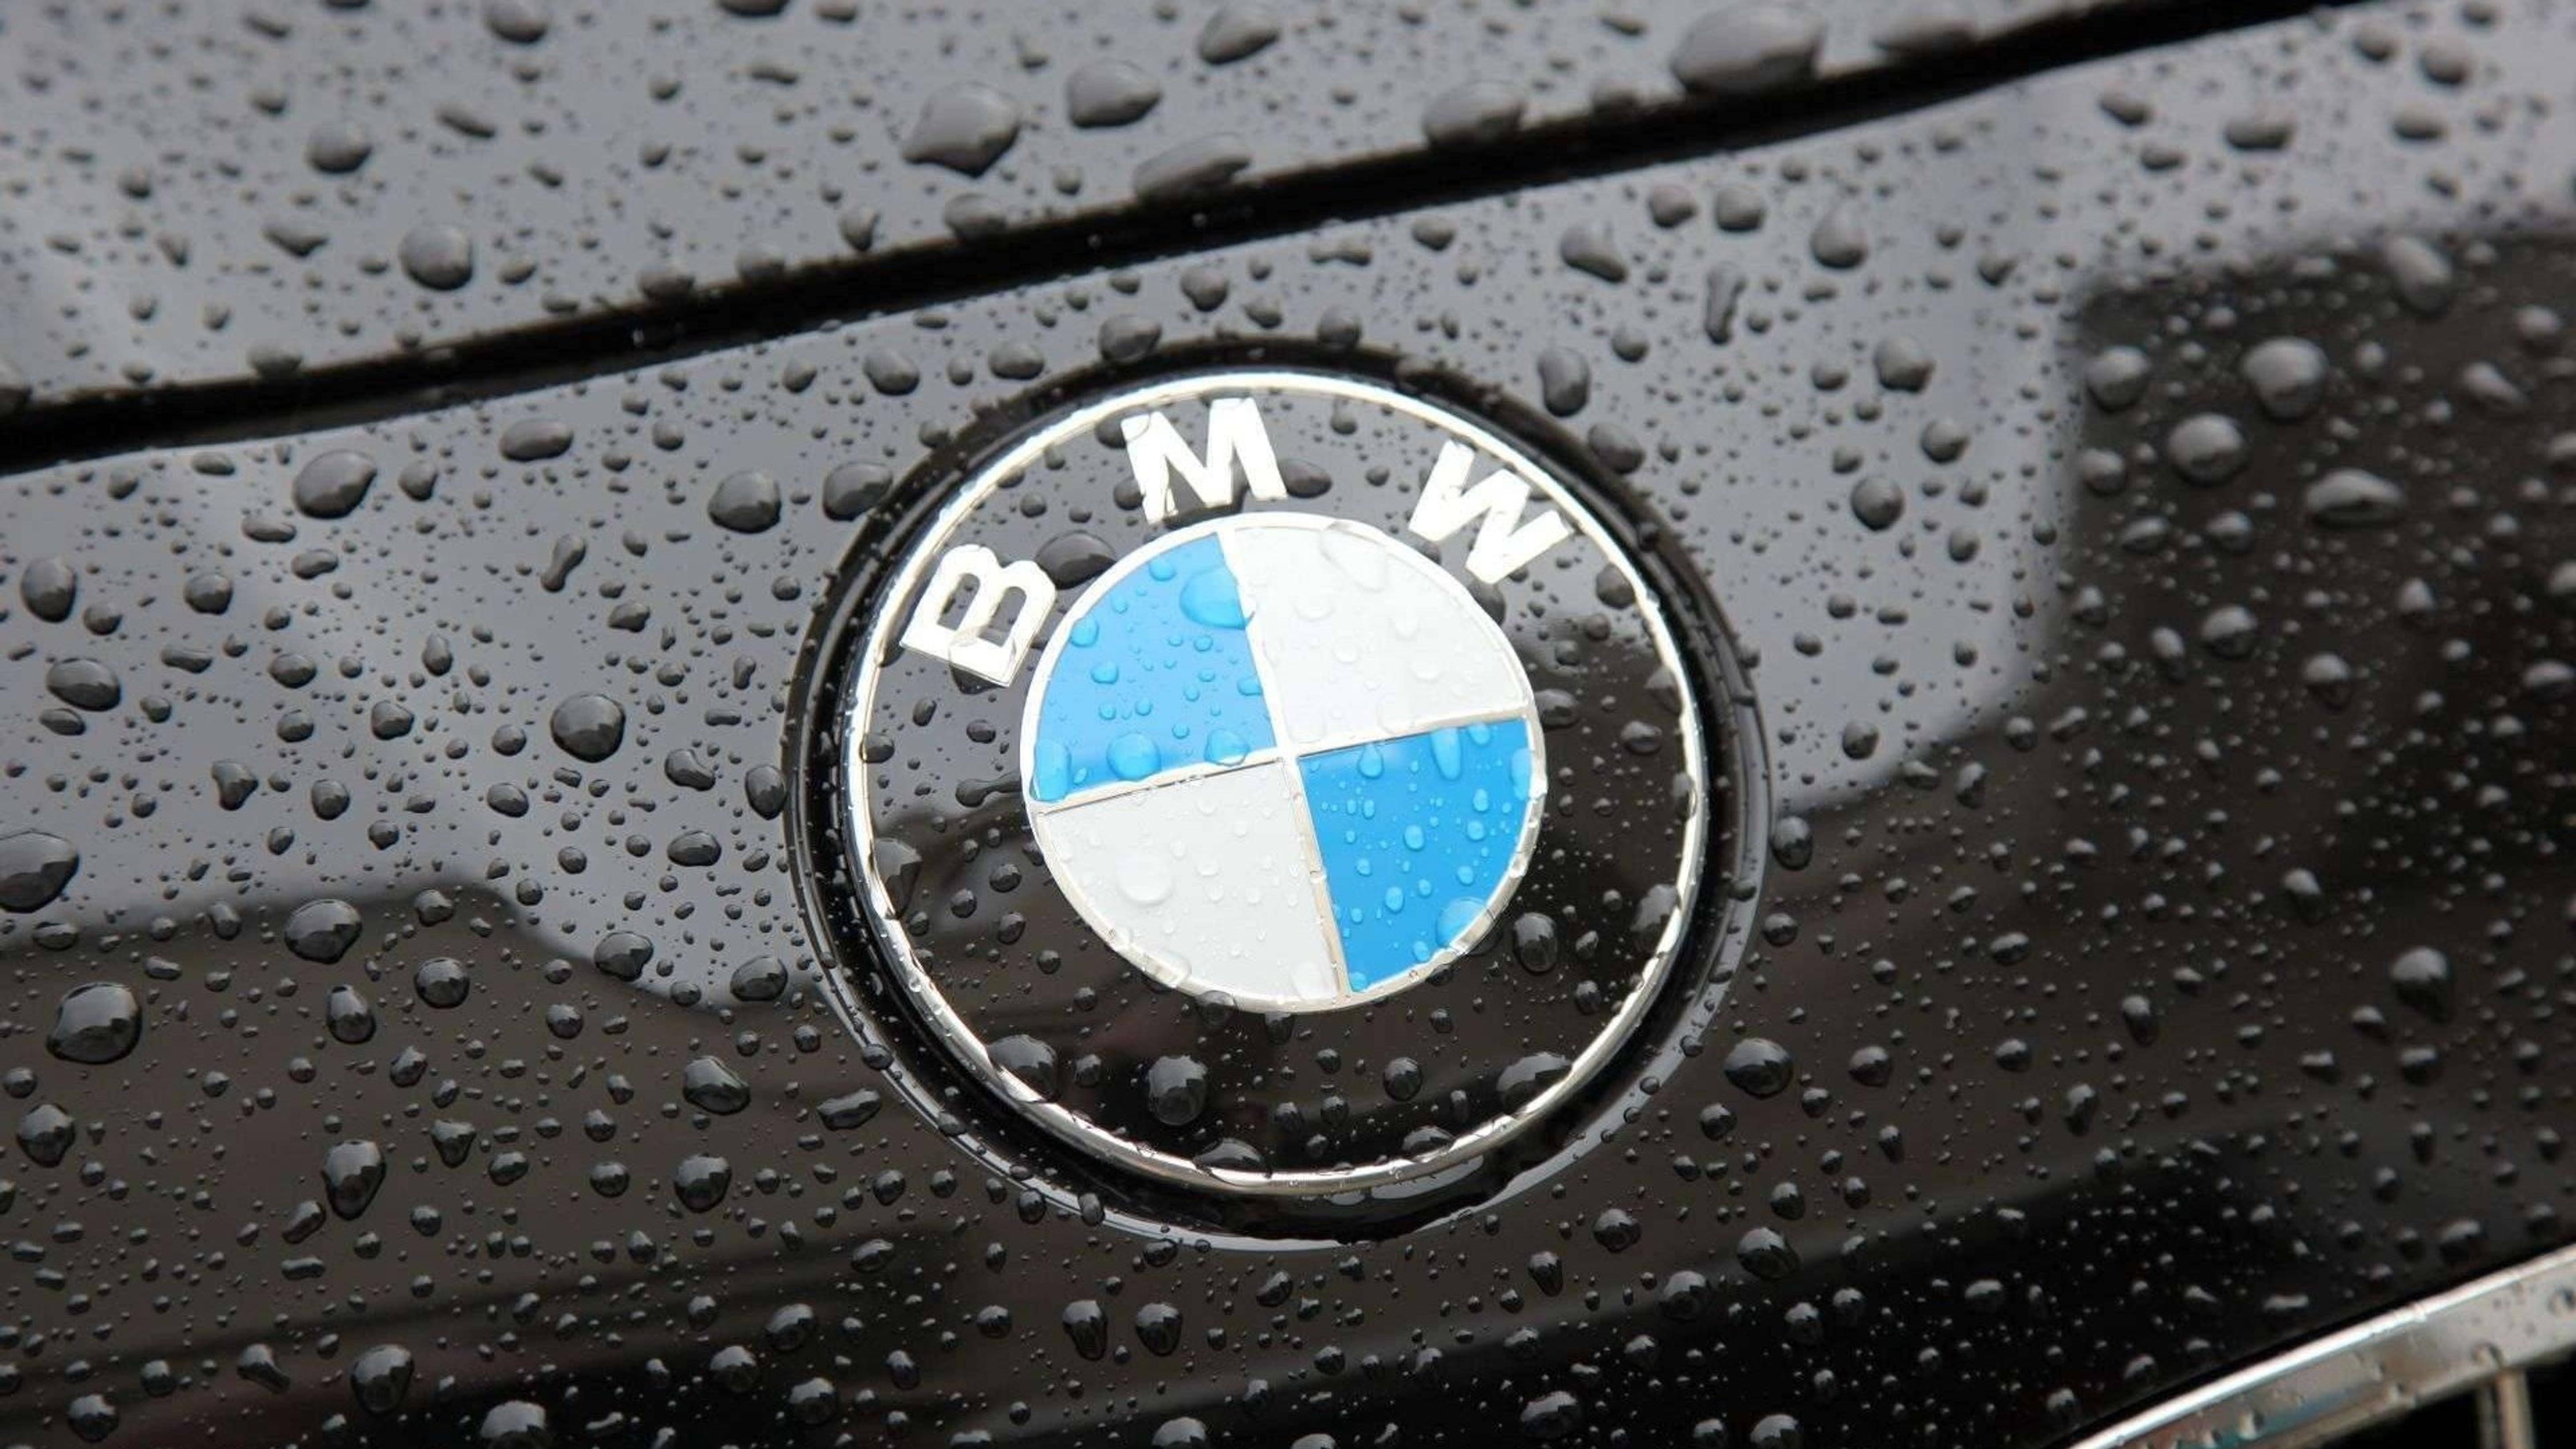 Great Wallpaper Logo Bmw - the-bmw-logo-on-a-black-car-with-raindrops-3840x2160  Snapshot_483479.jpg